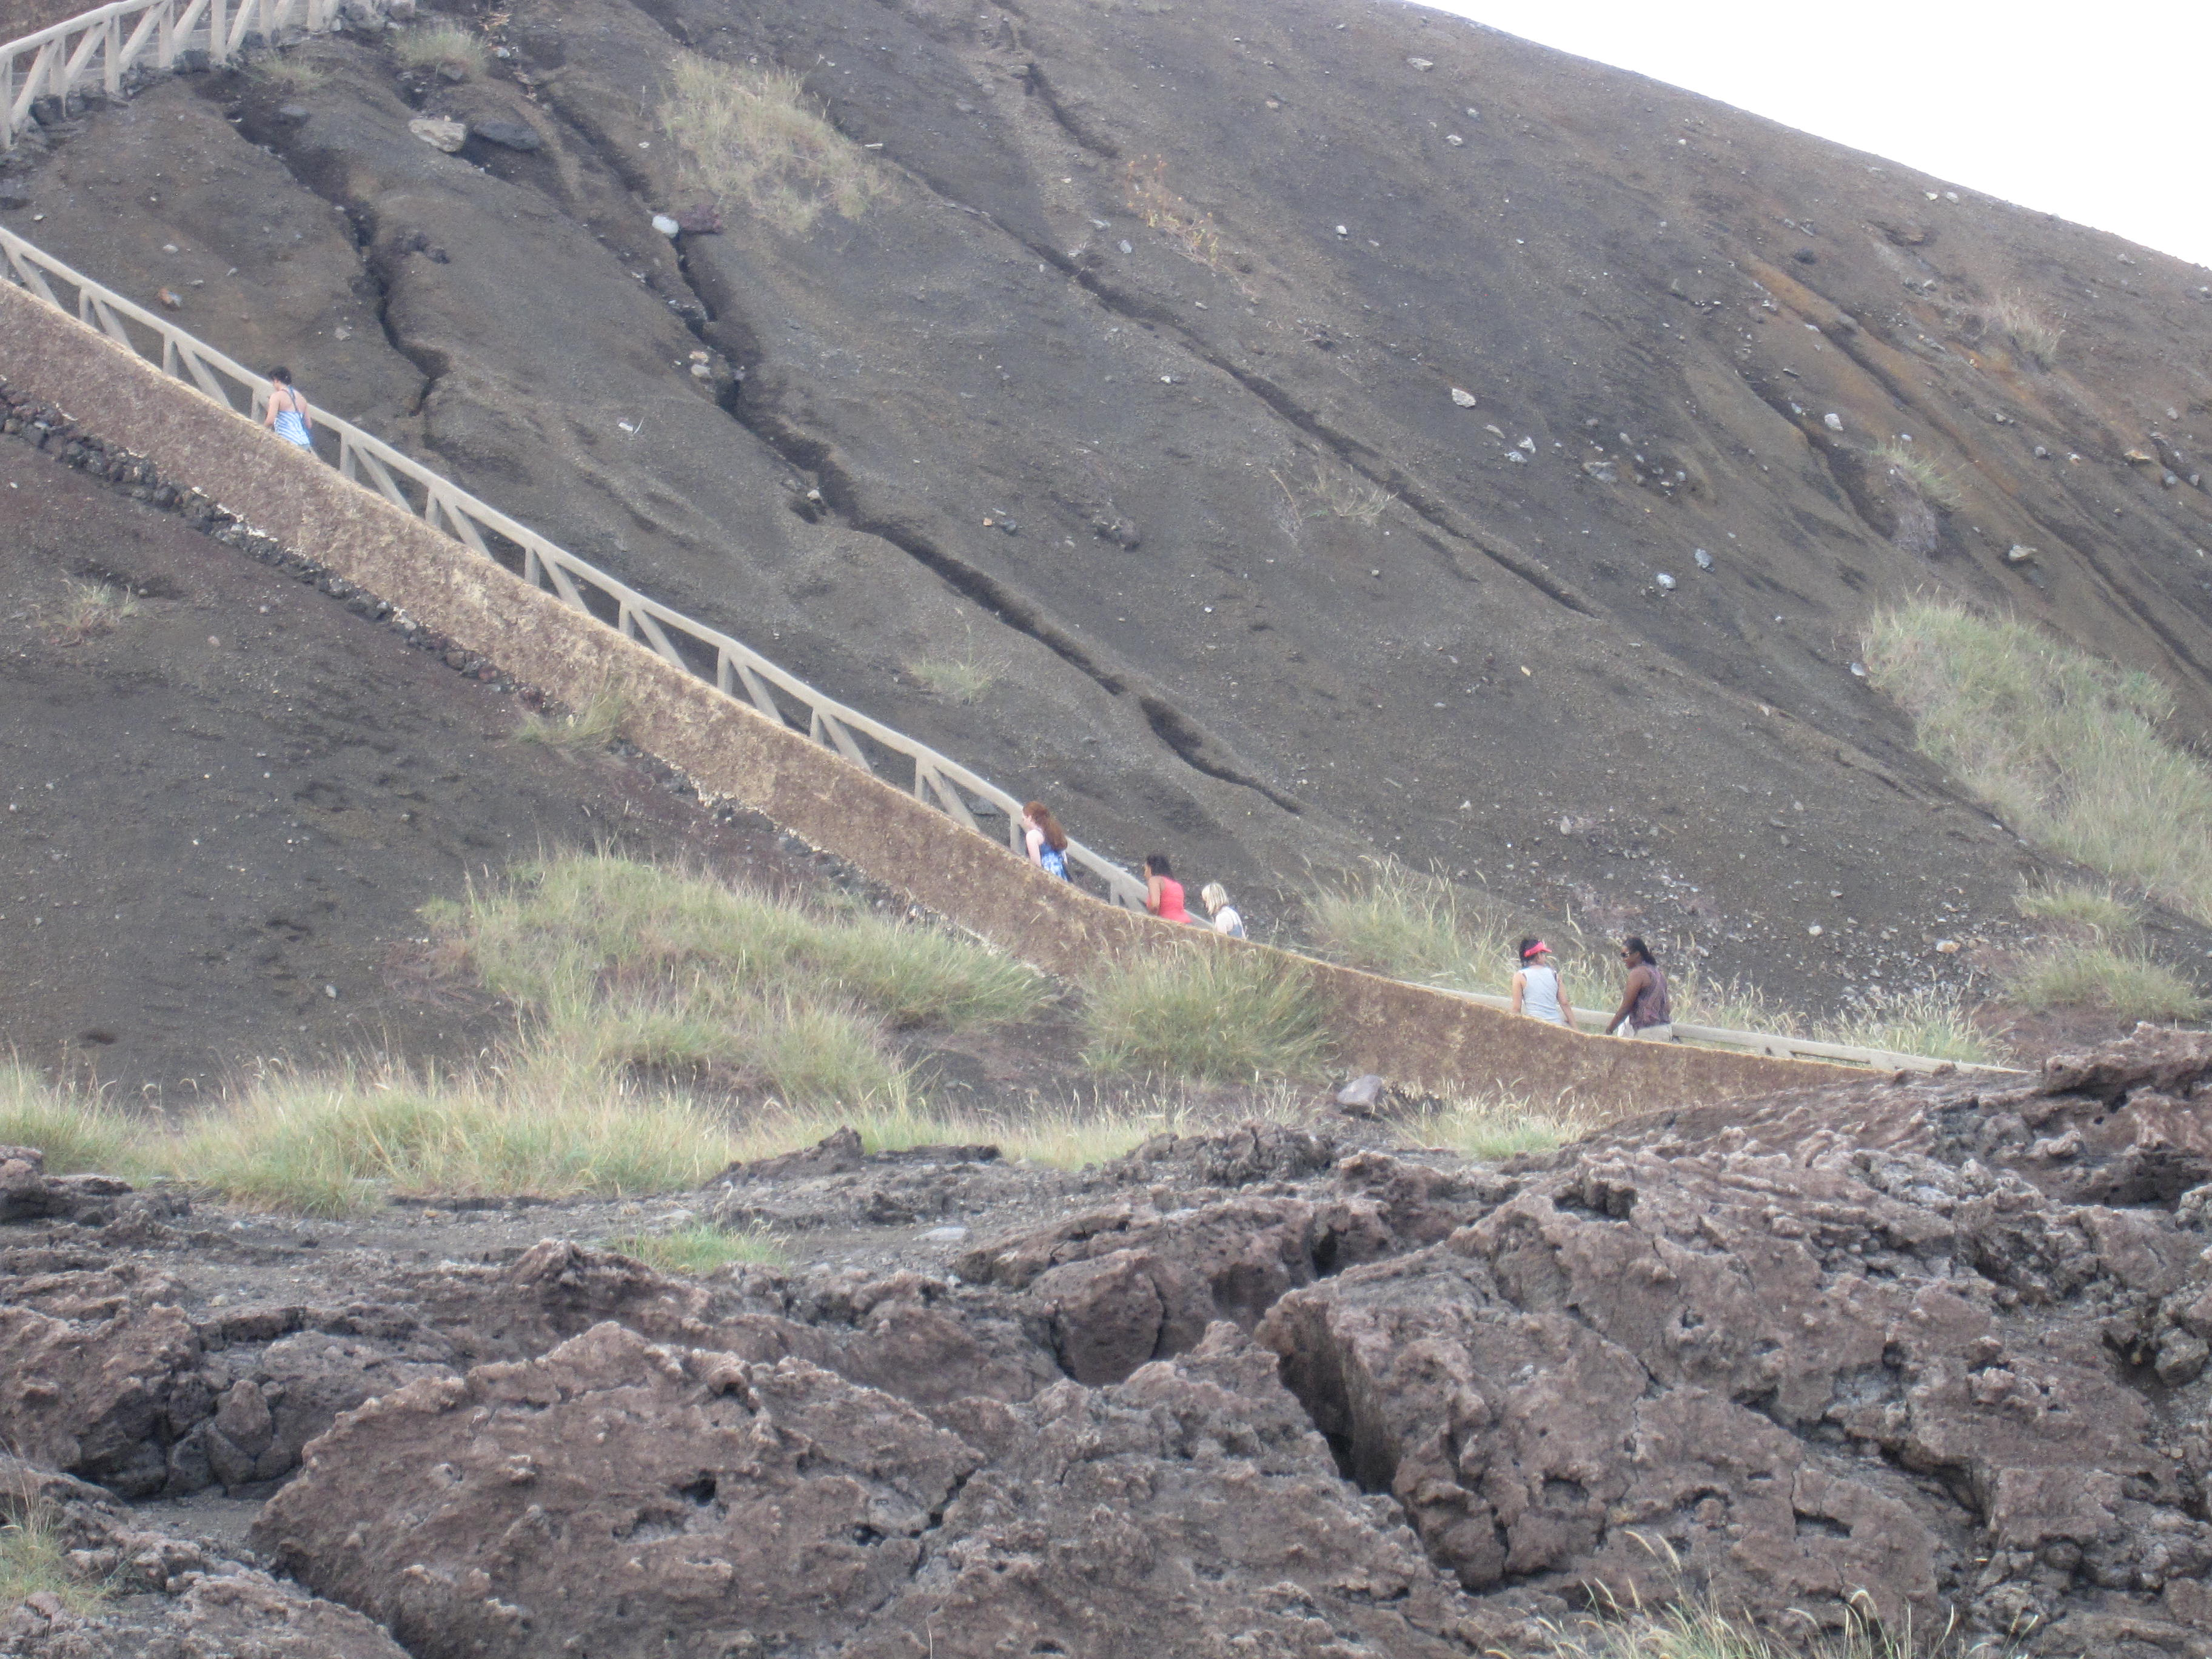 Nicaragua 2 -volcano climbing (Masaya Volcano Park)